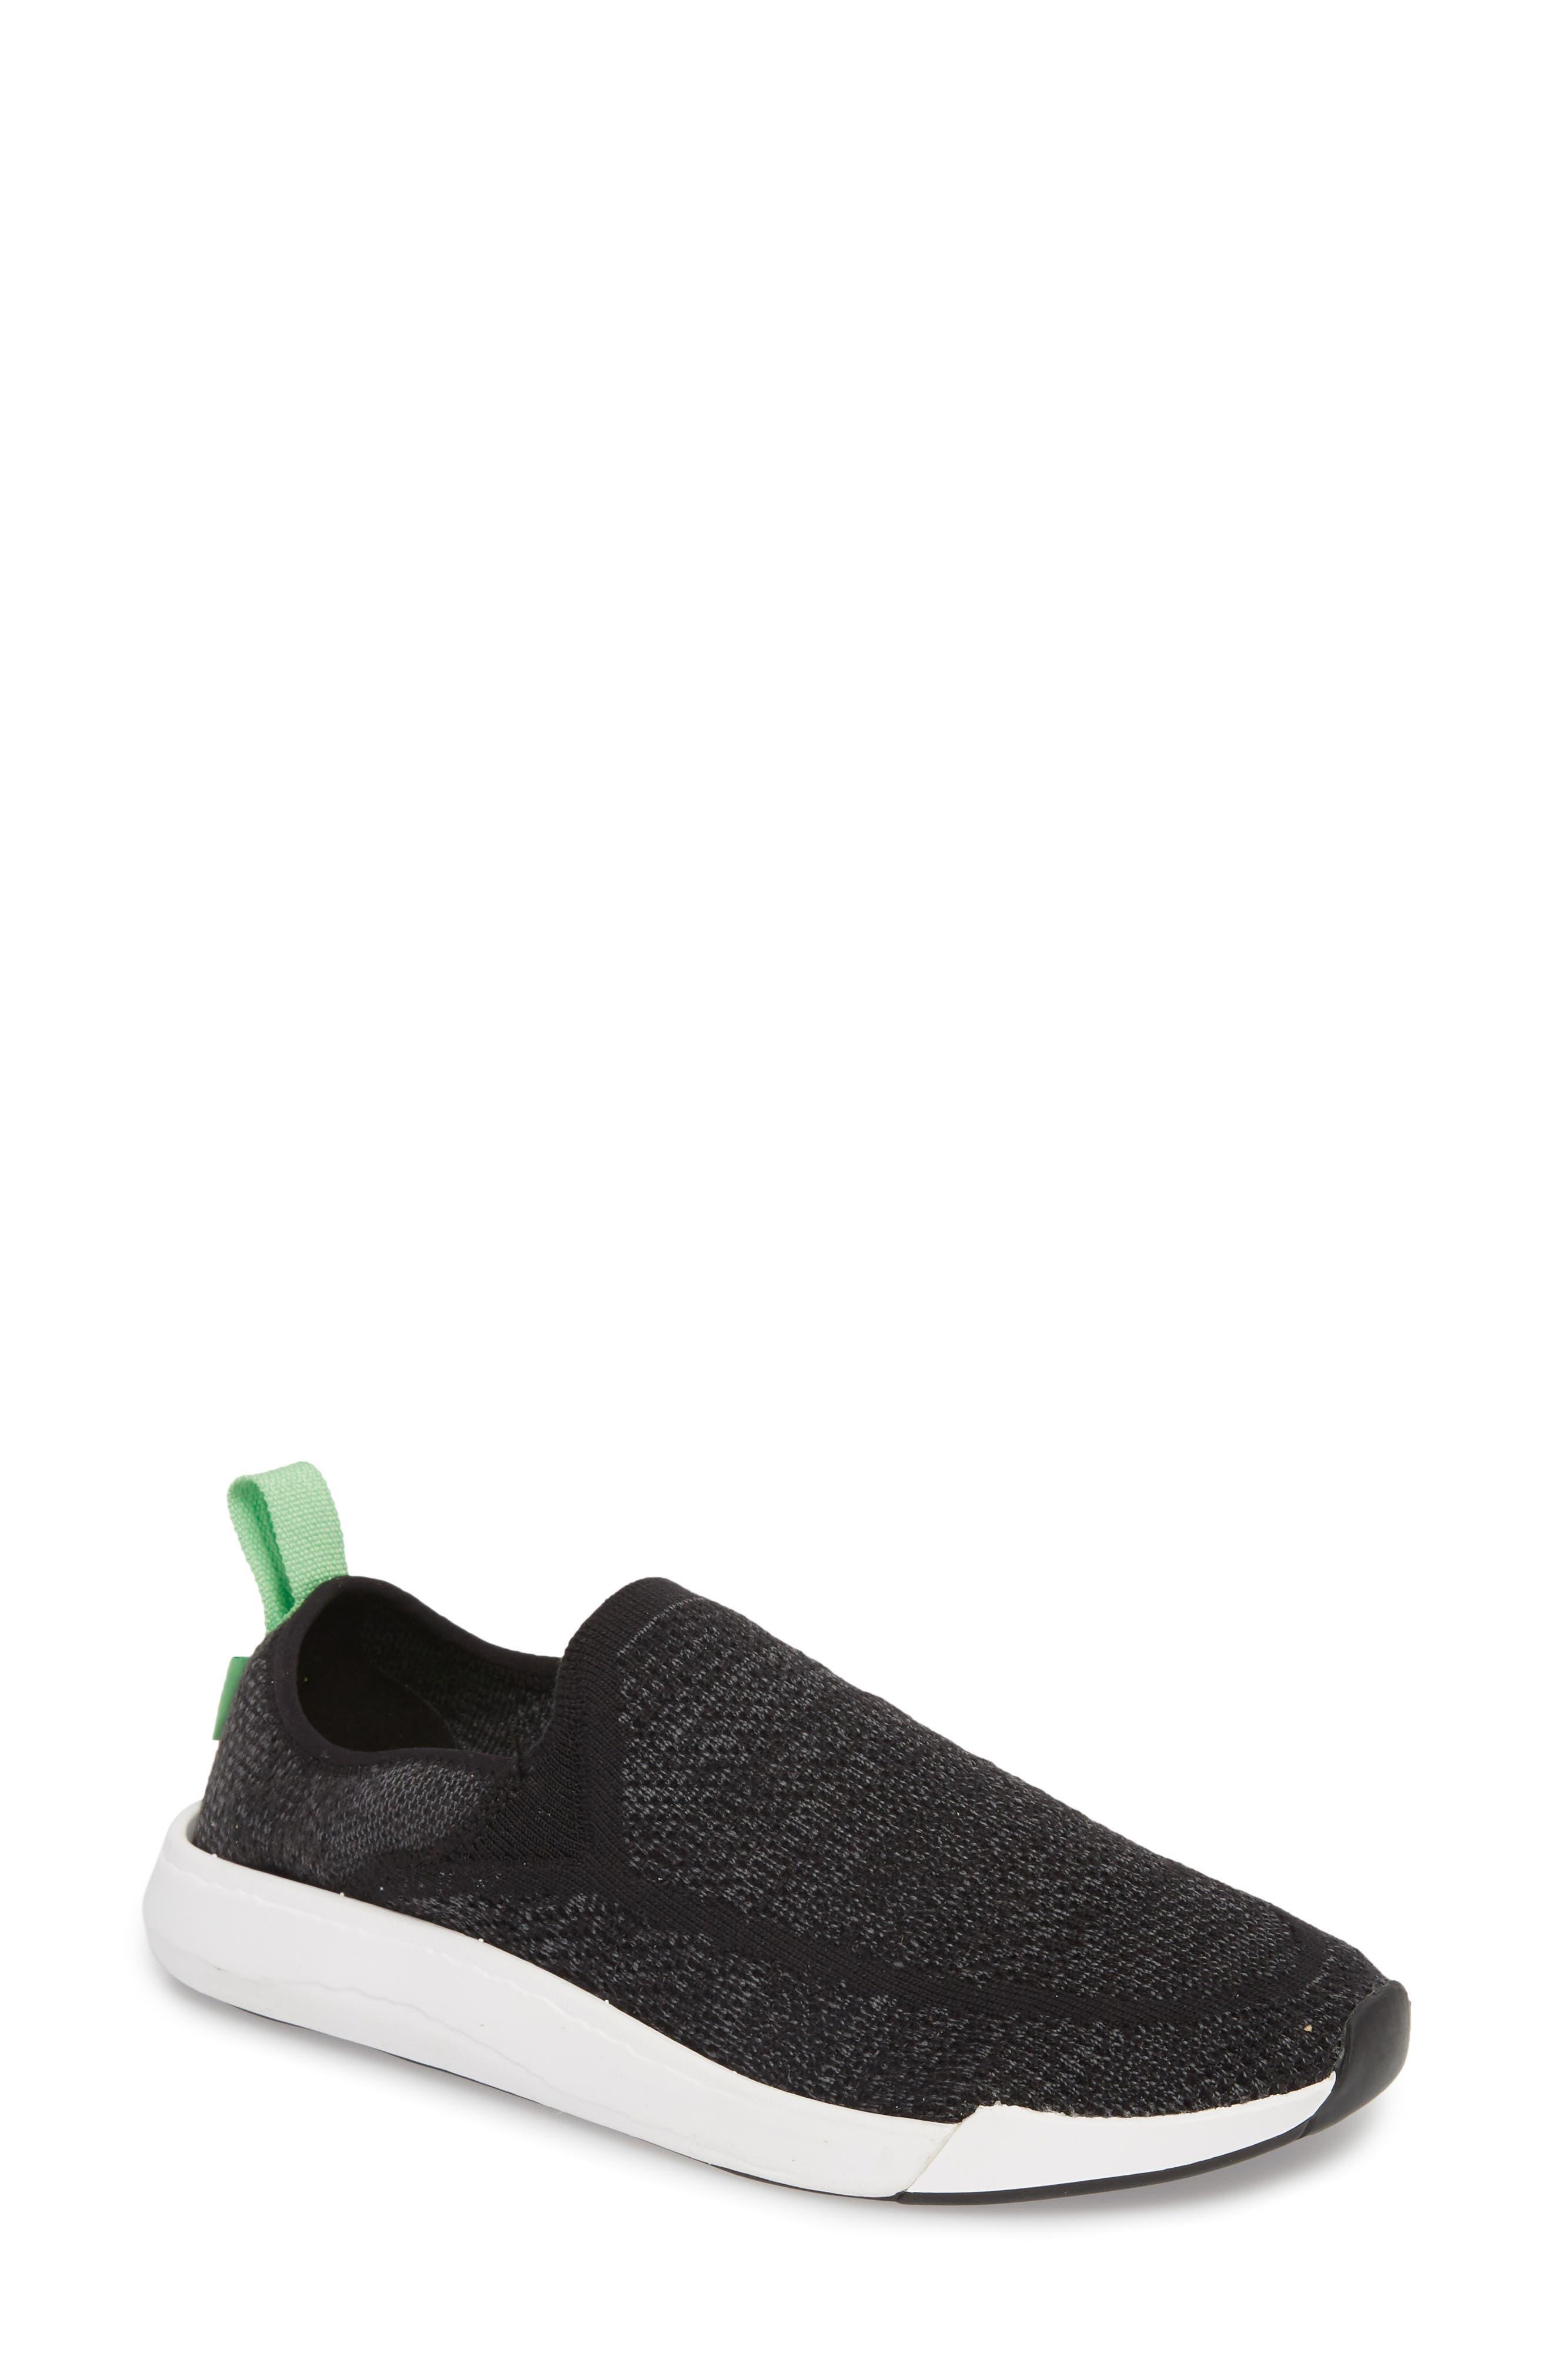 Chiba Quest Knit Slip-On Sneaker,                             Main thumbnail 1, color,                             Black